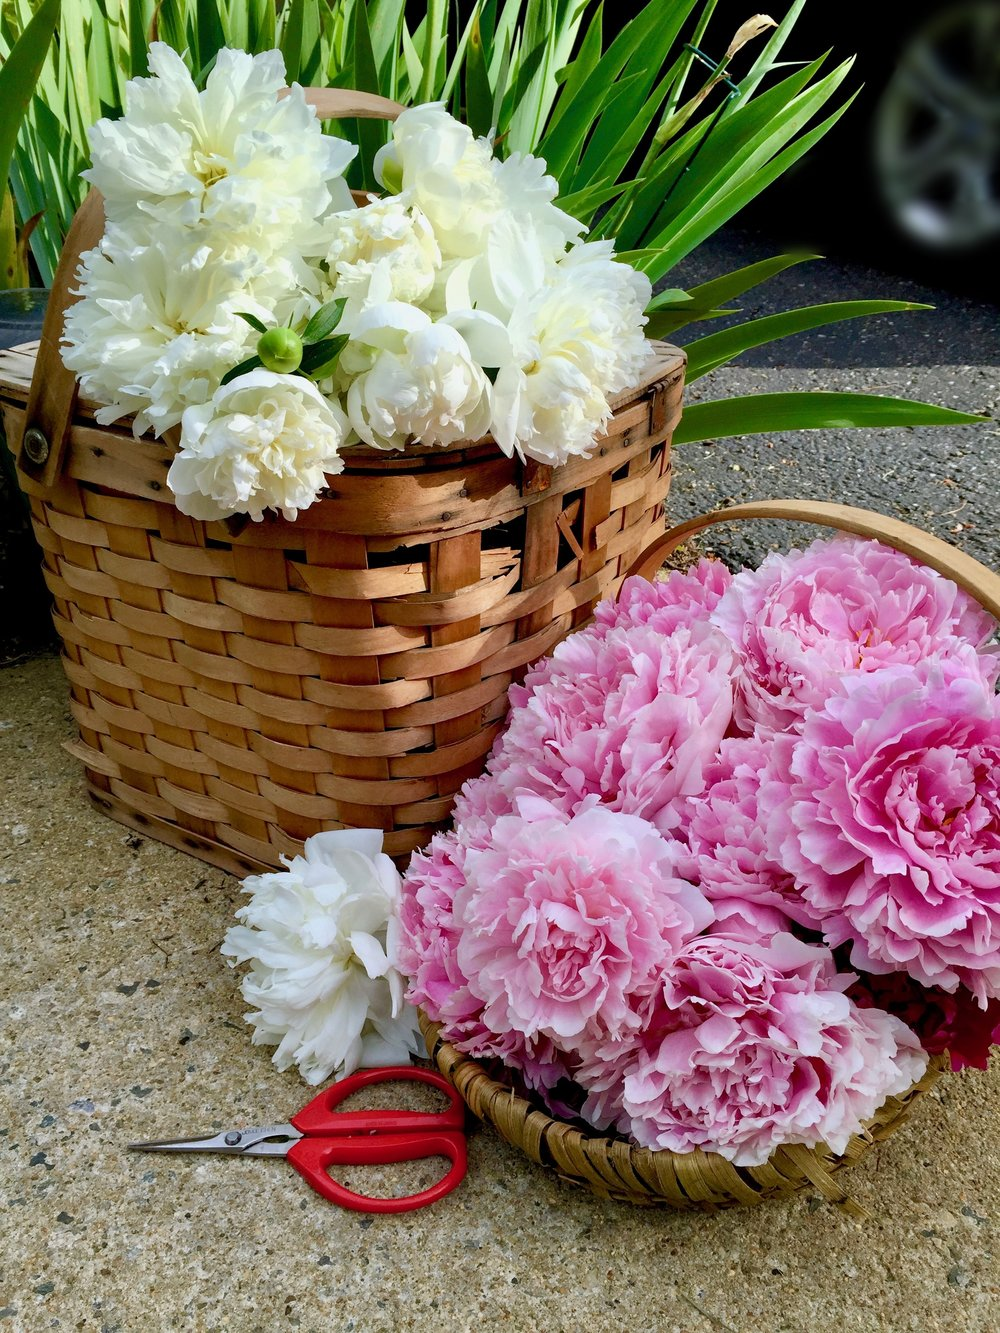 pink and white peonies in basket.jpg